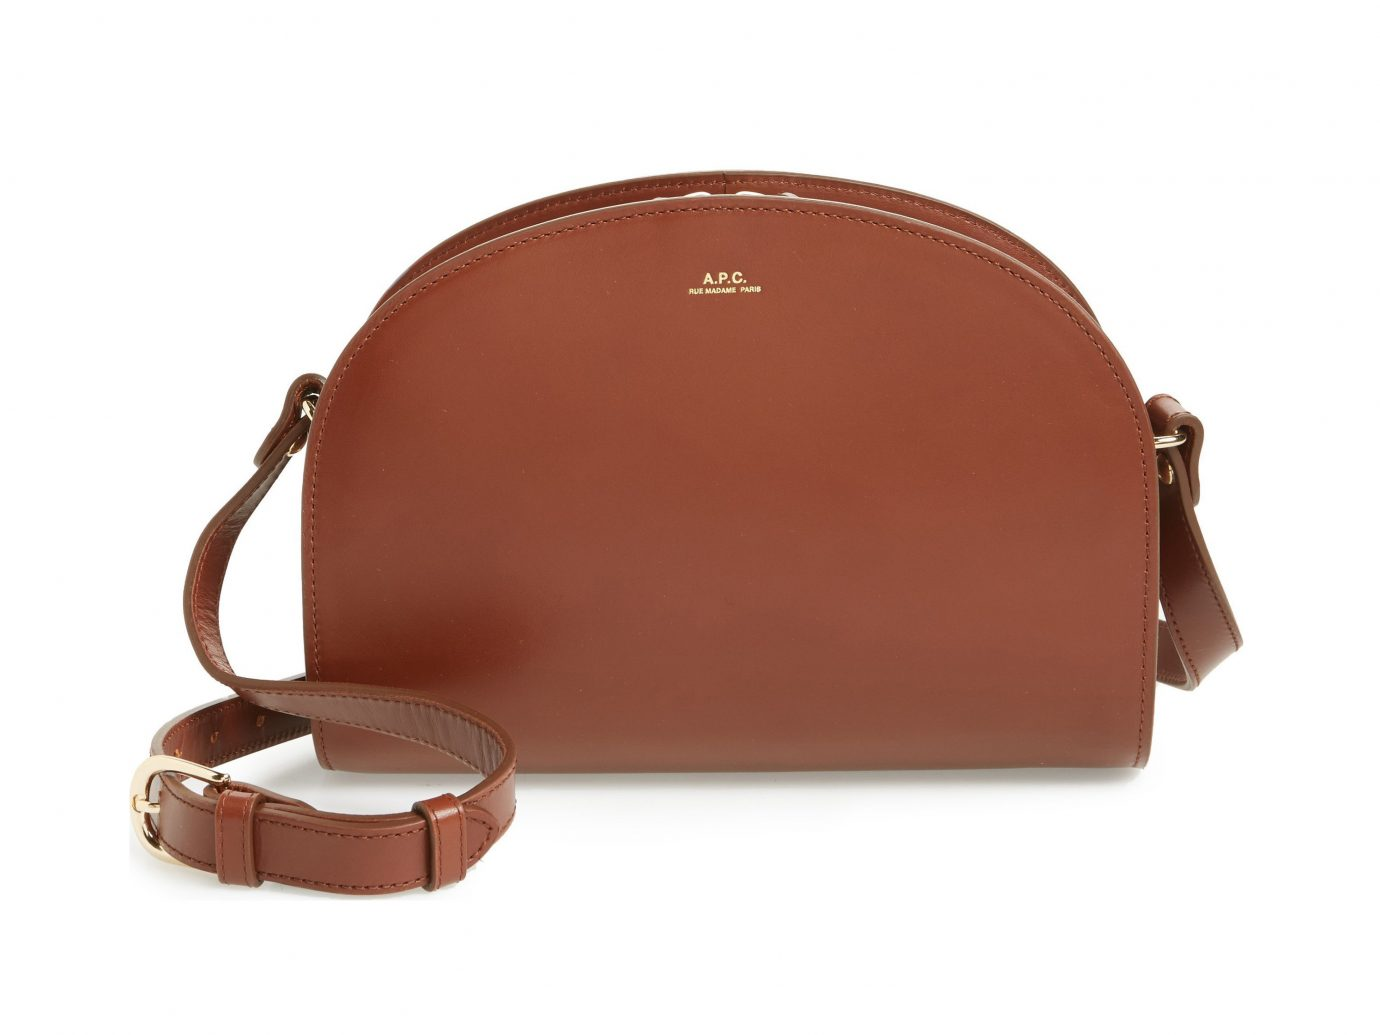 Outdoors + Adventure Trip Ideas bag brown fashion accessory leather shoulder bag product handbag product design strap caramel color messenger bag